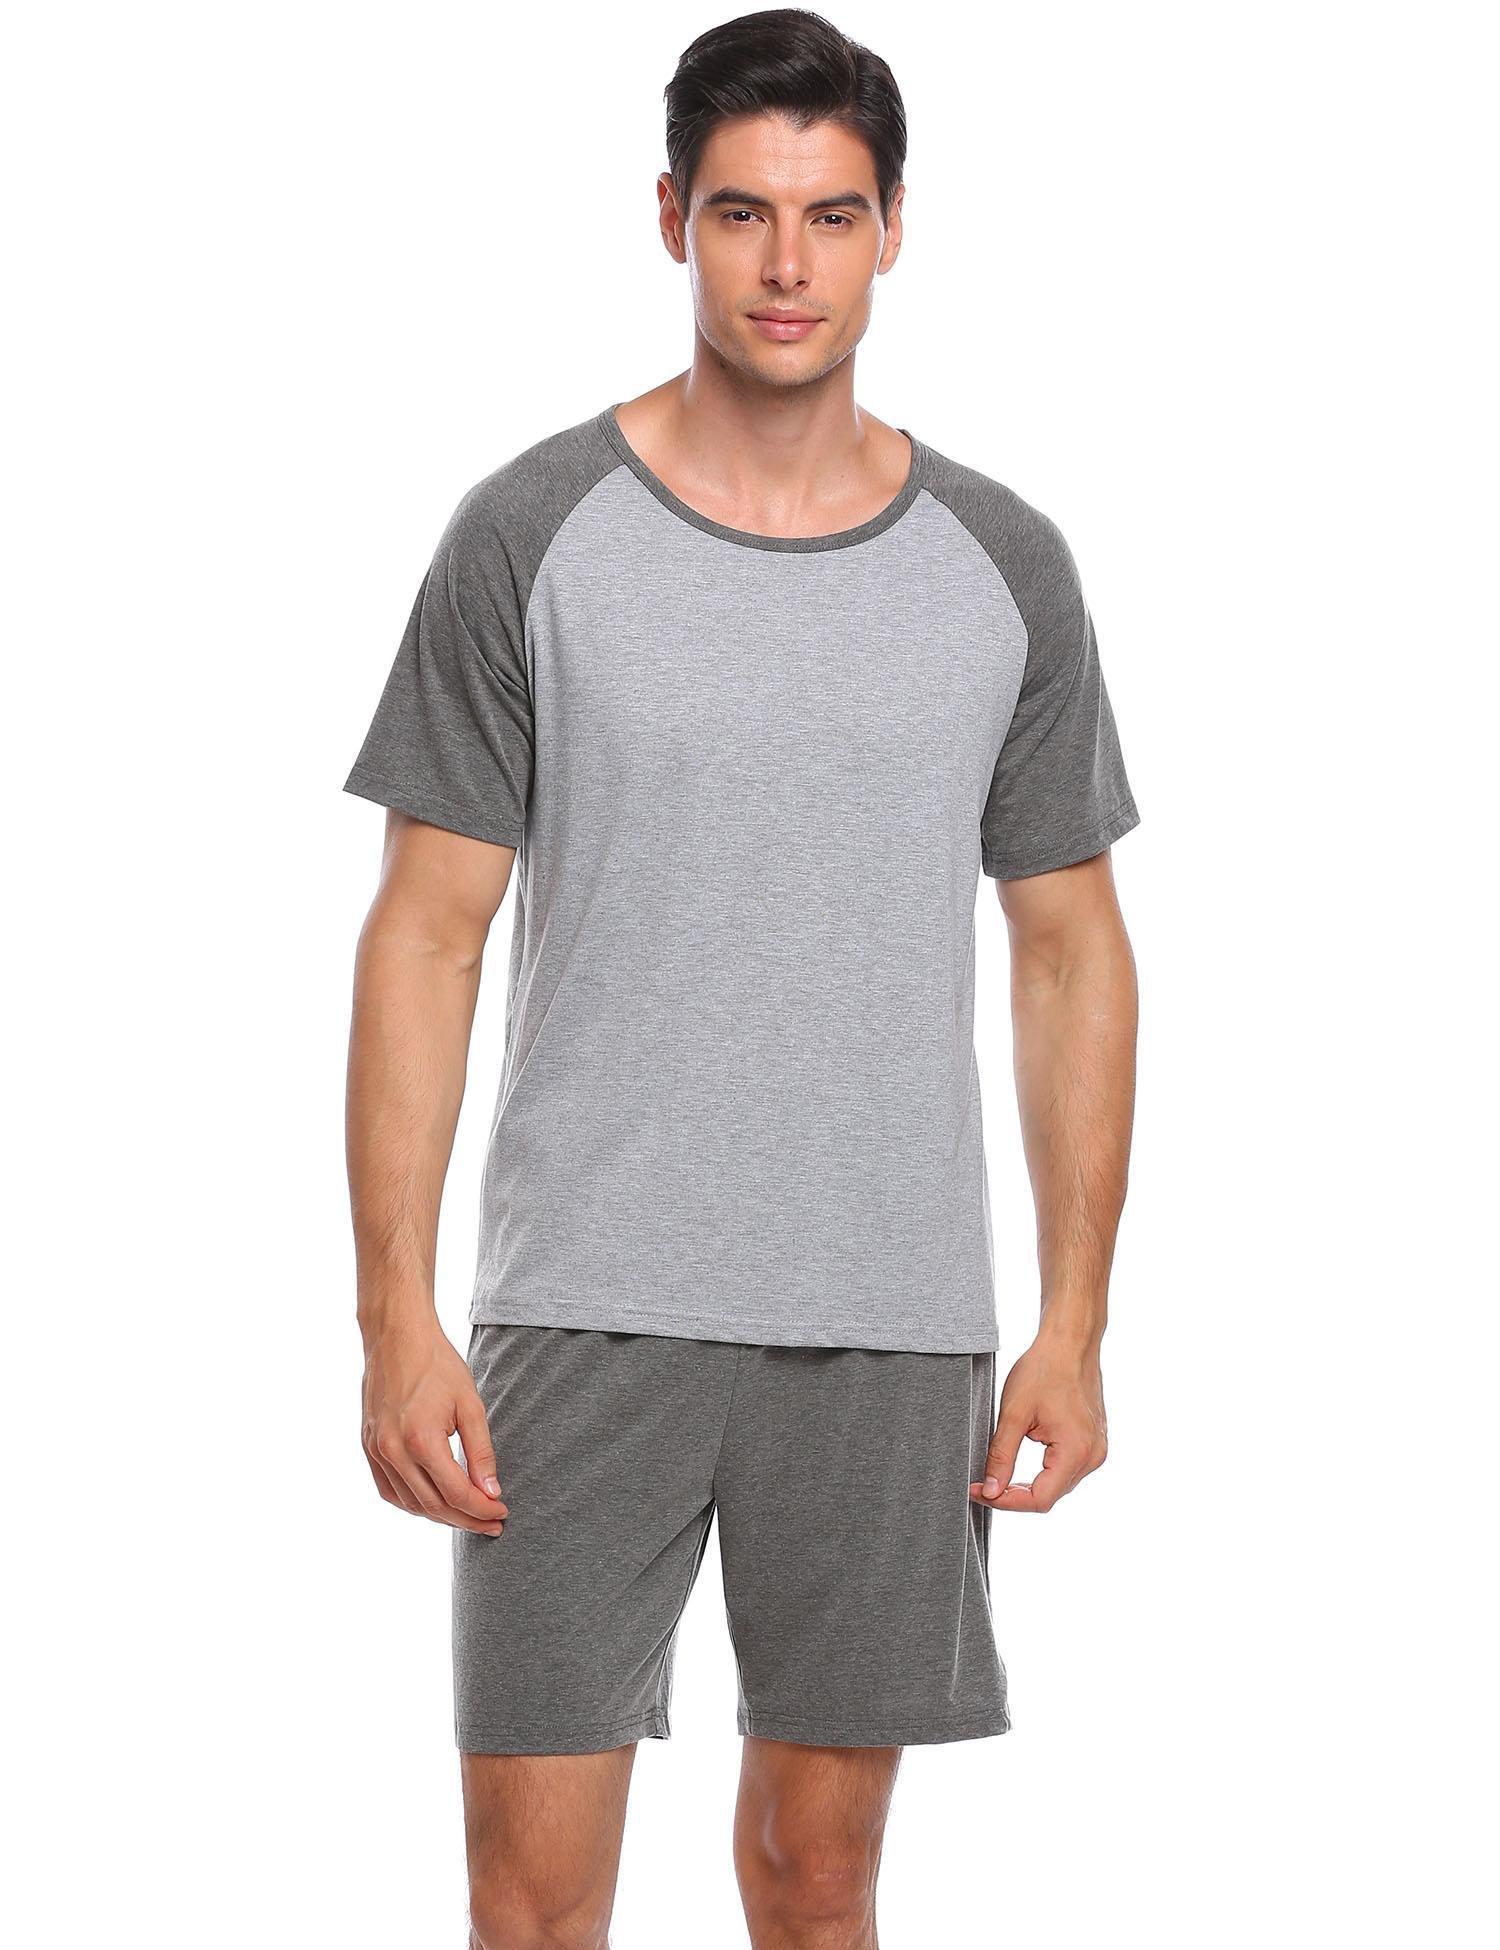 Ekouaer Mens Raglan Short-Sleeve Top With Shorts Pajama Sets, Grey ,Medium